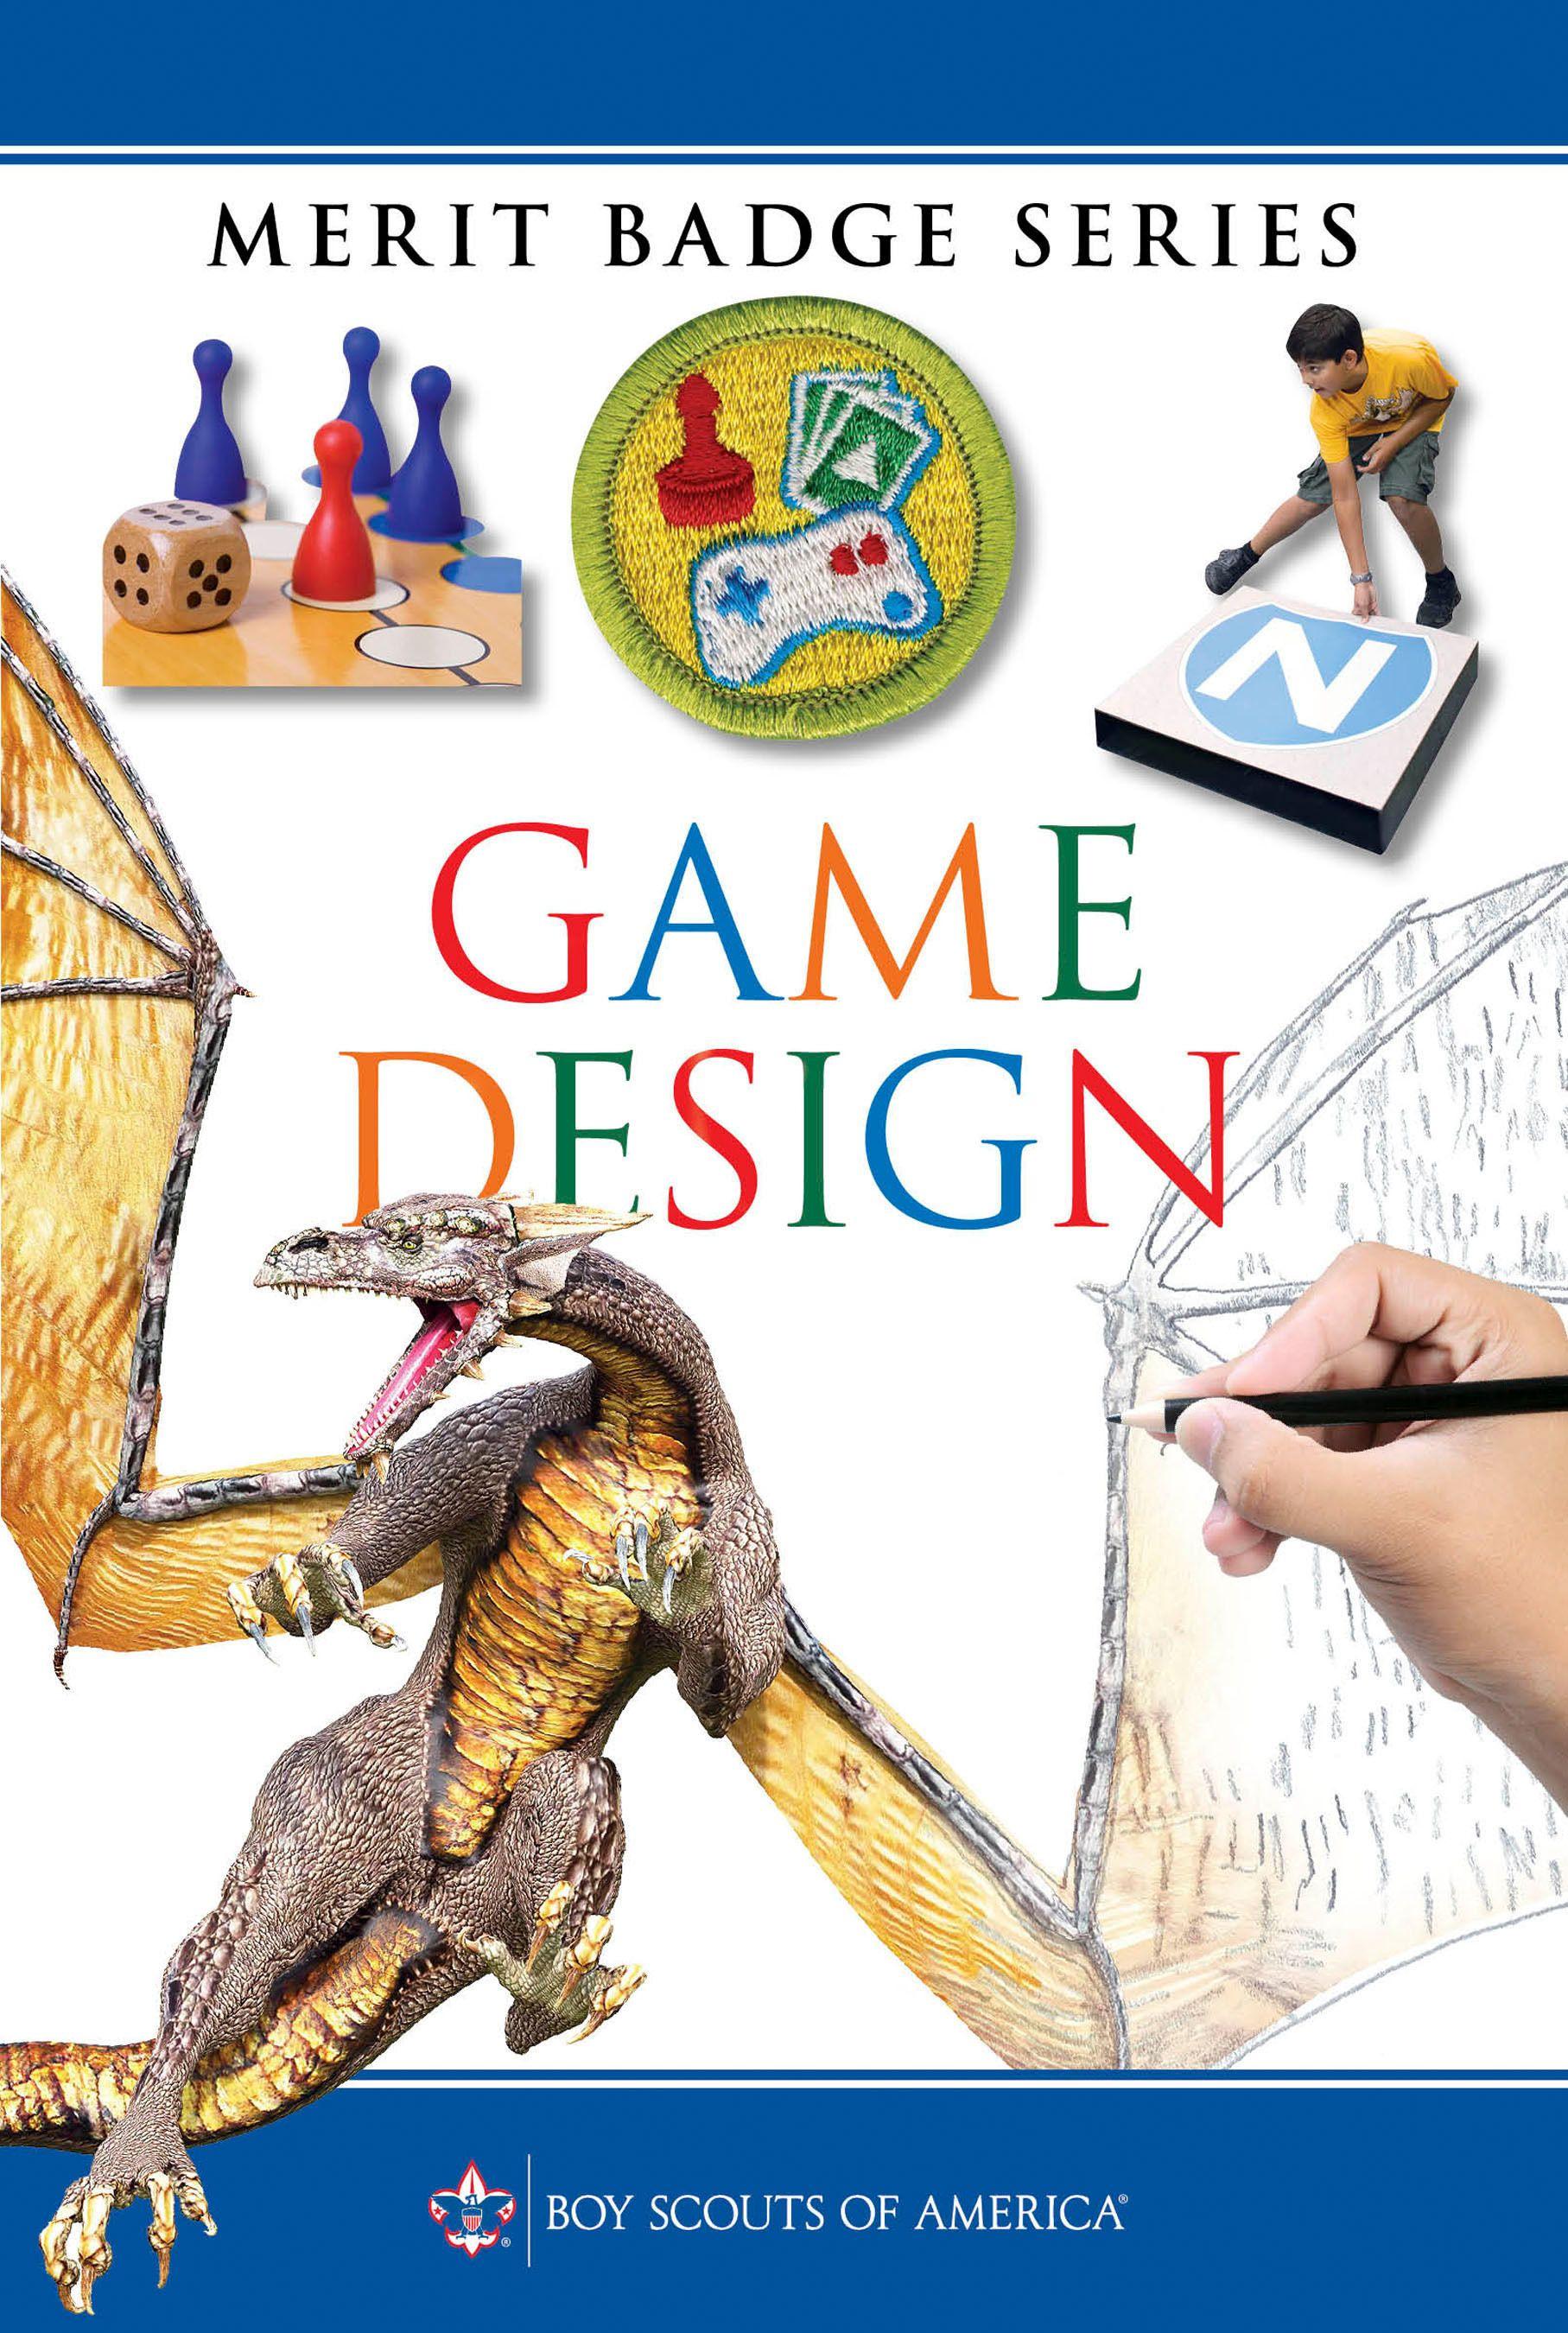 Boy Scouts Of Meric To Troduce G Me Design Merit B Dge Ign